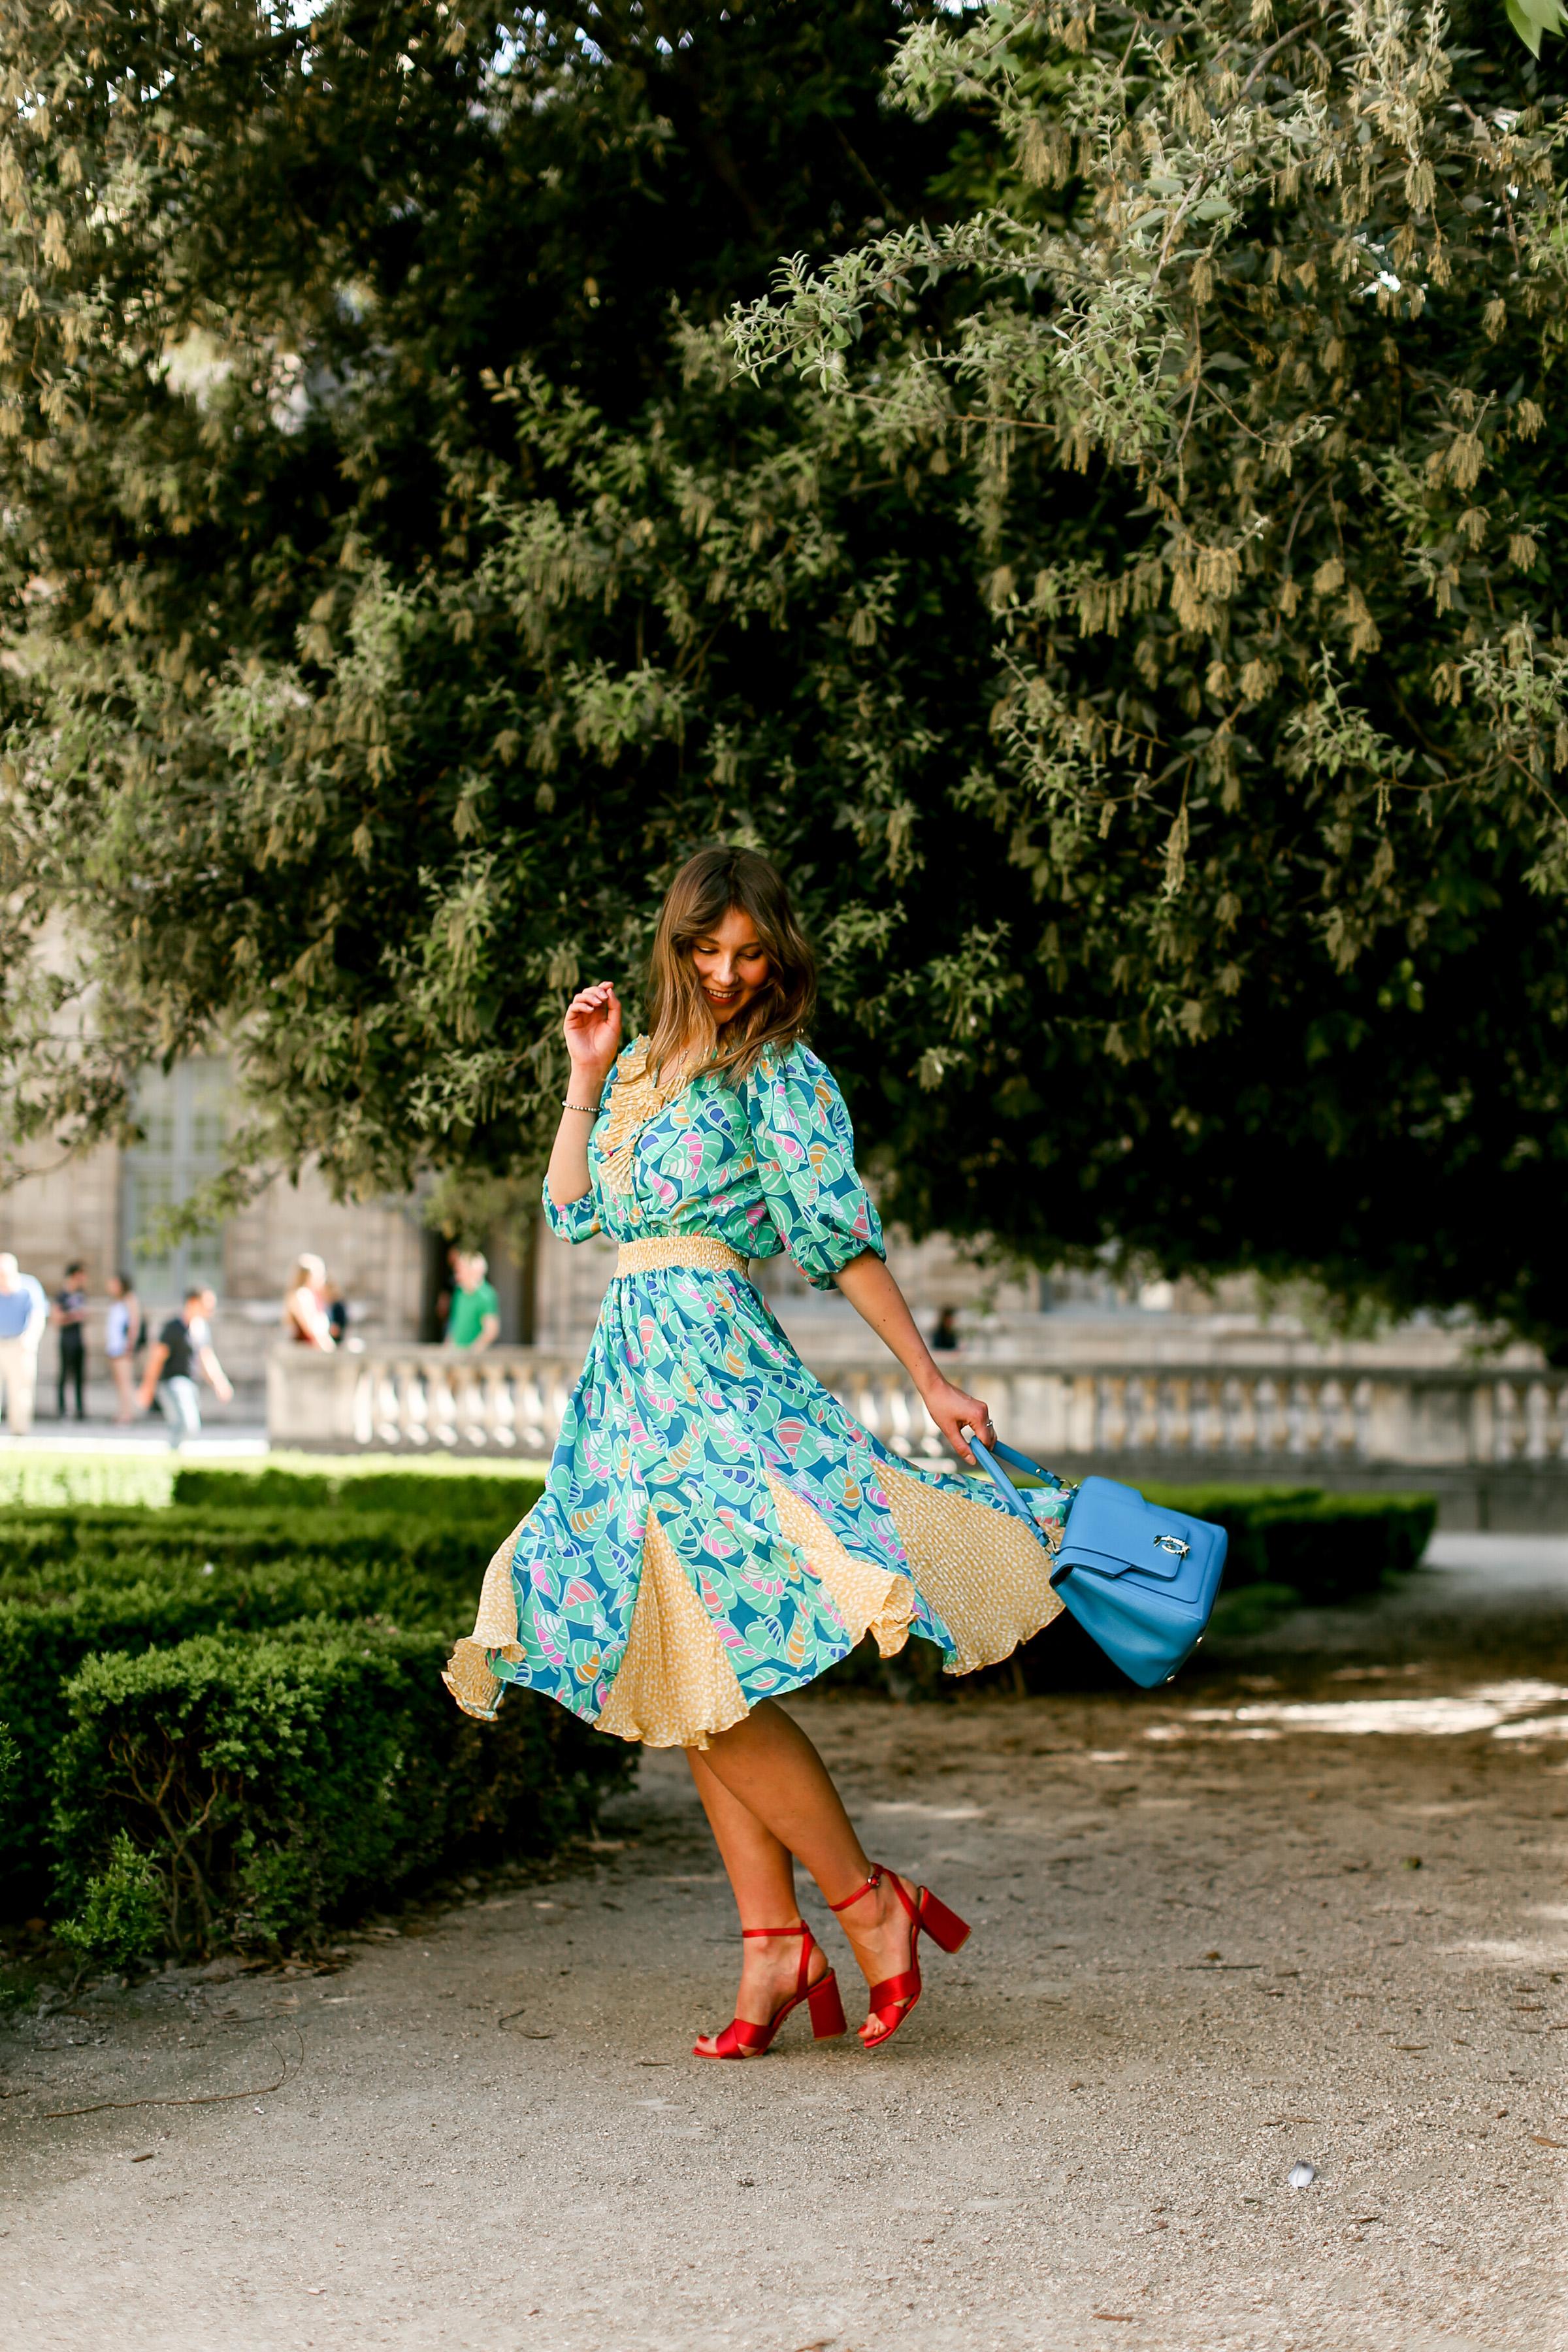 paris-vintage-dress-angelica-7095